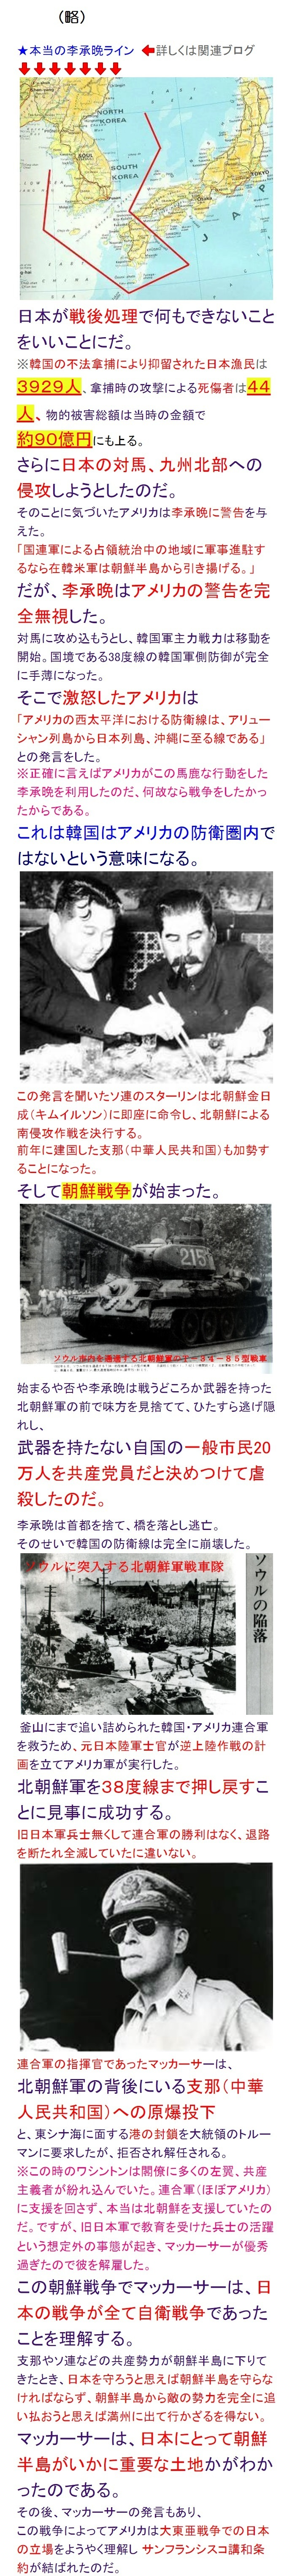 朝鮮戦争の真実_1